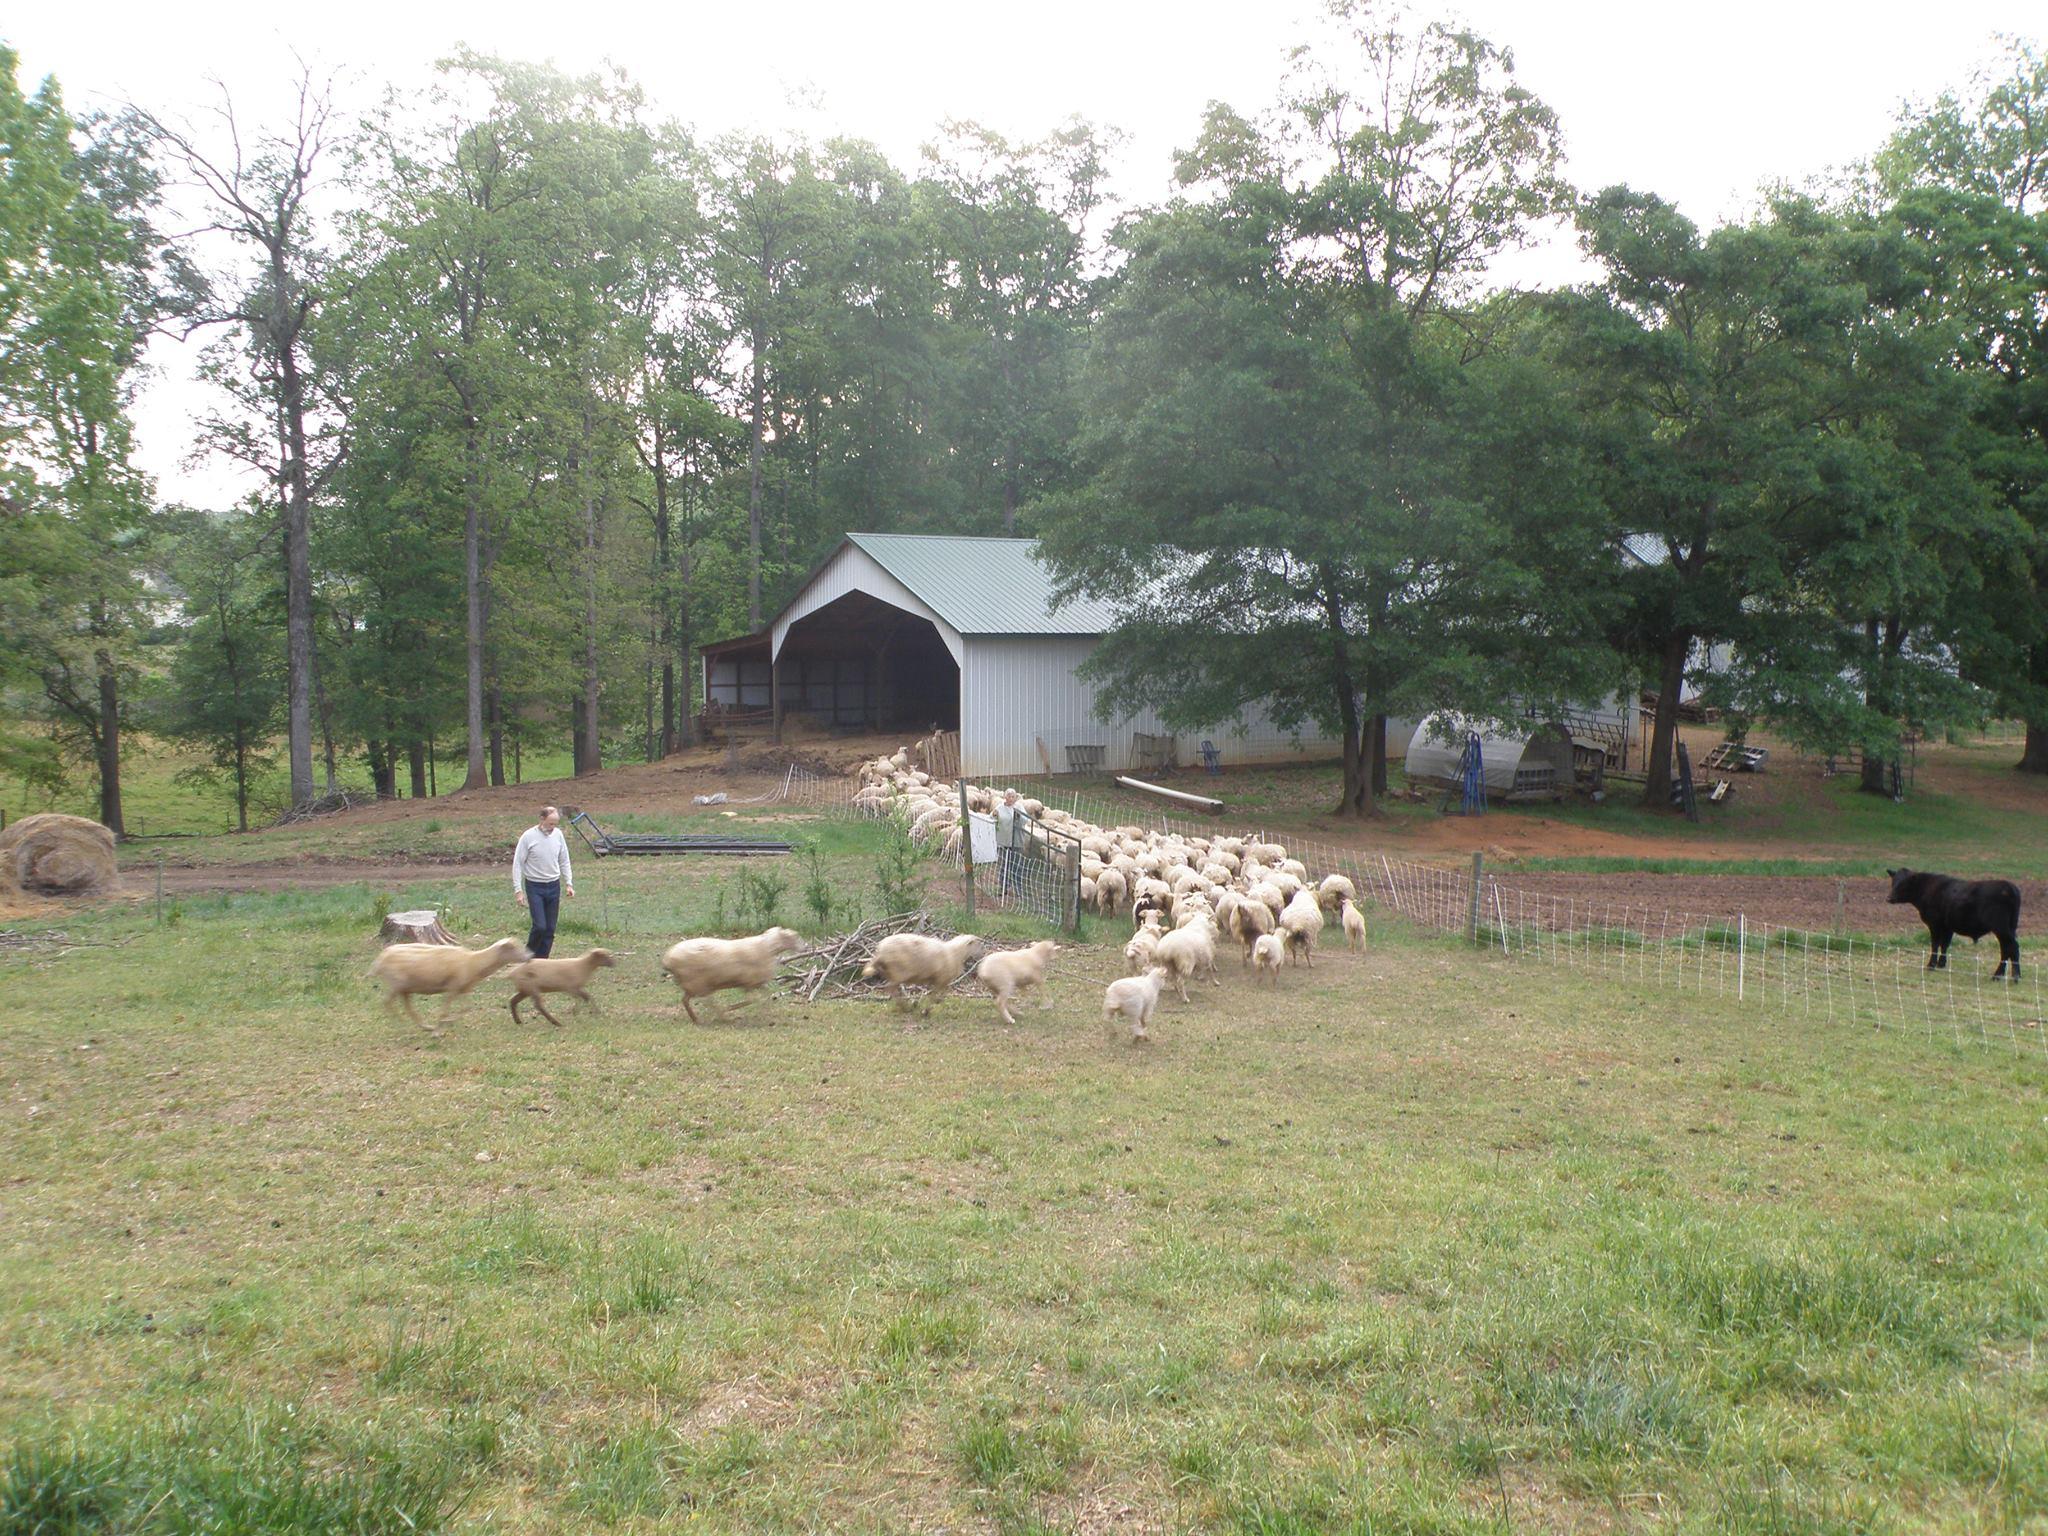 Image via  Hope Springs Farm